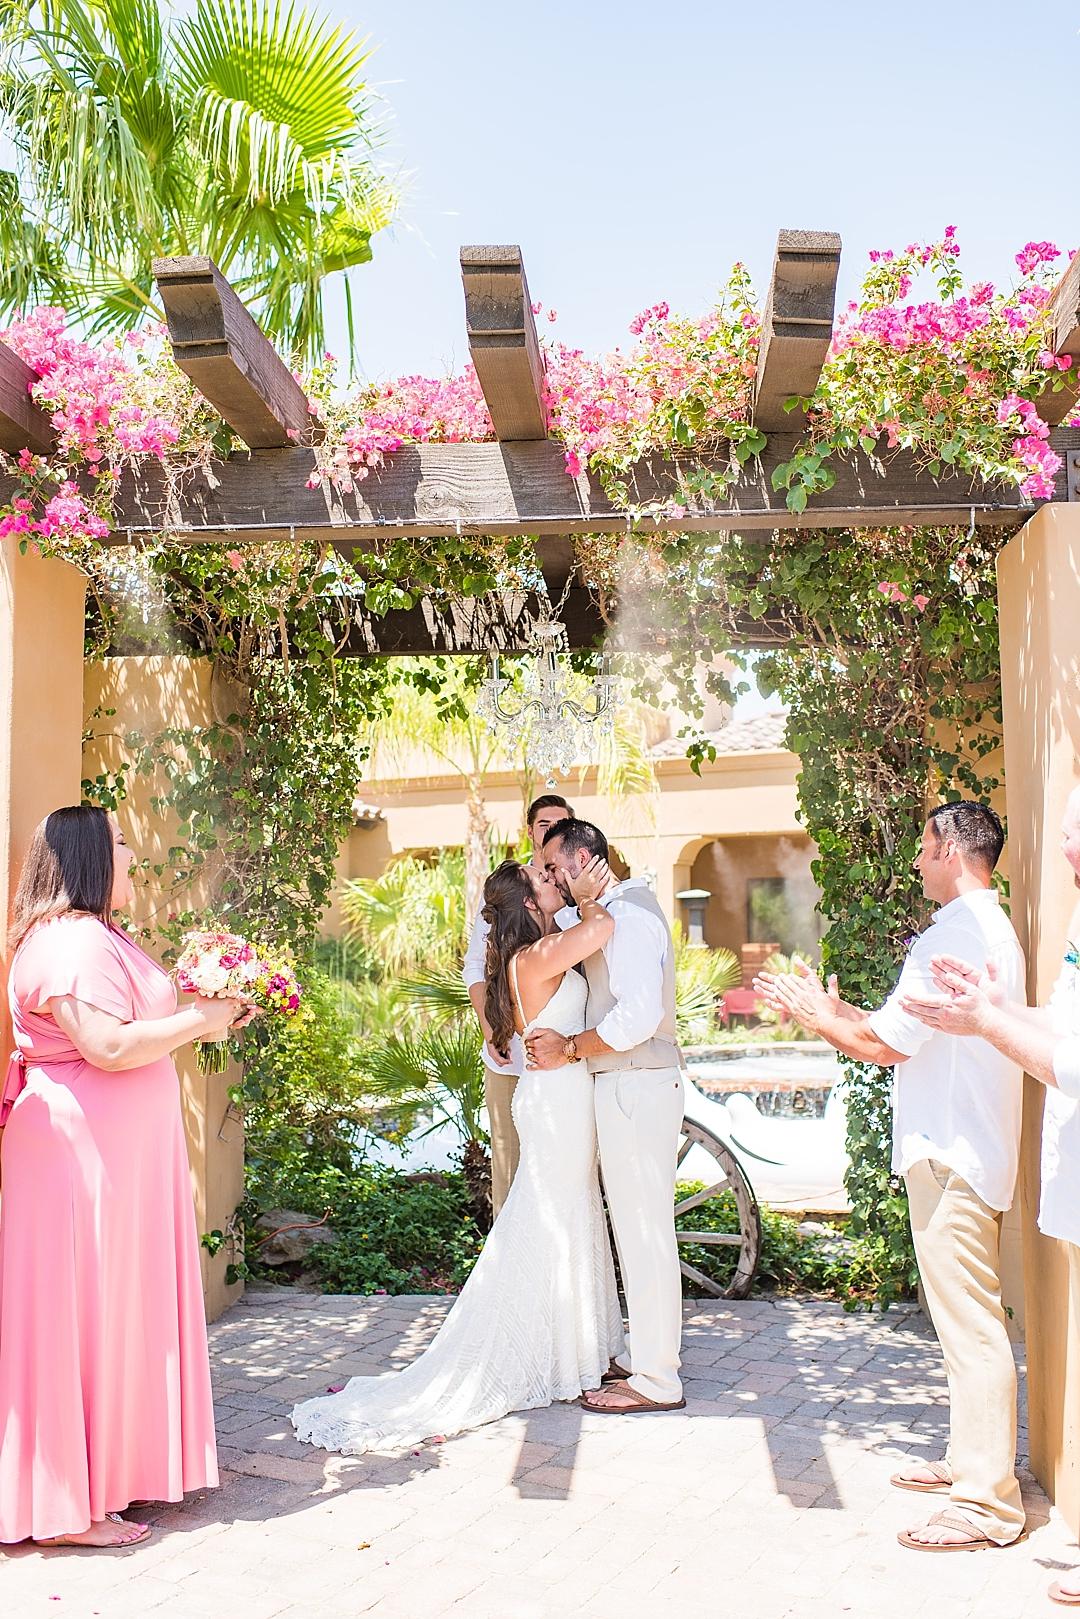 Laguna Seca Bermuda Dunes Wedding - Randy and Ashley Studios-20_WEB.jpg